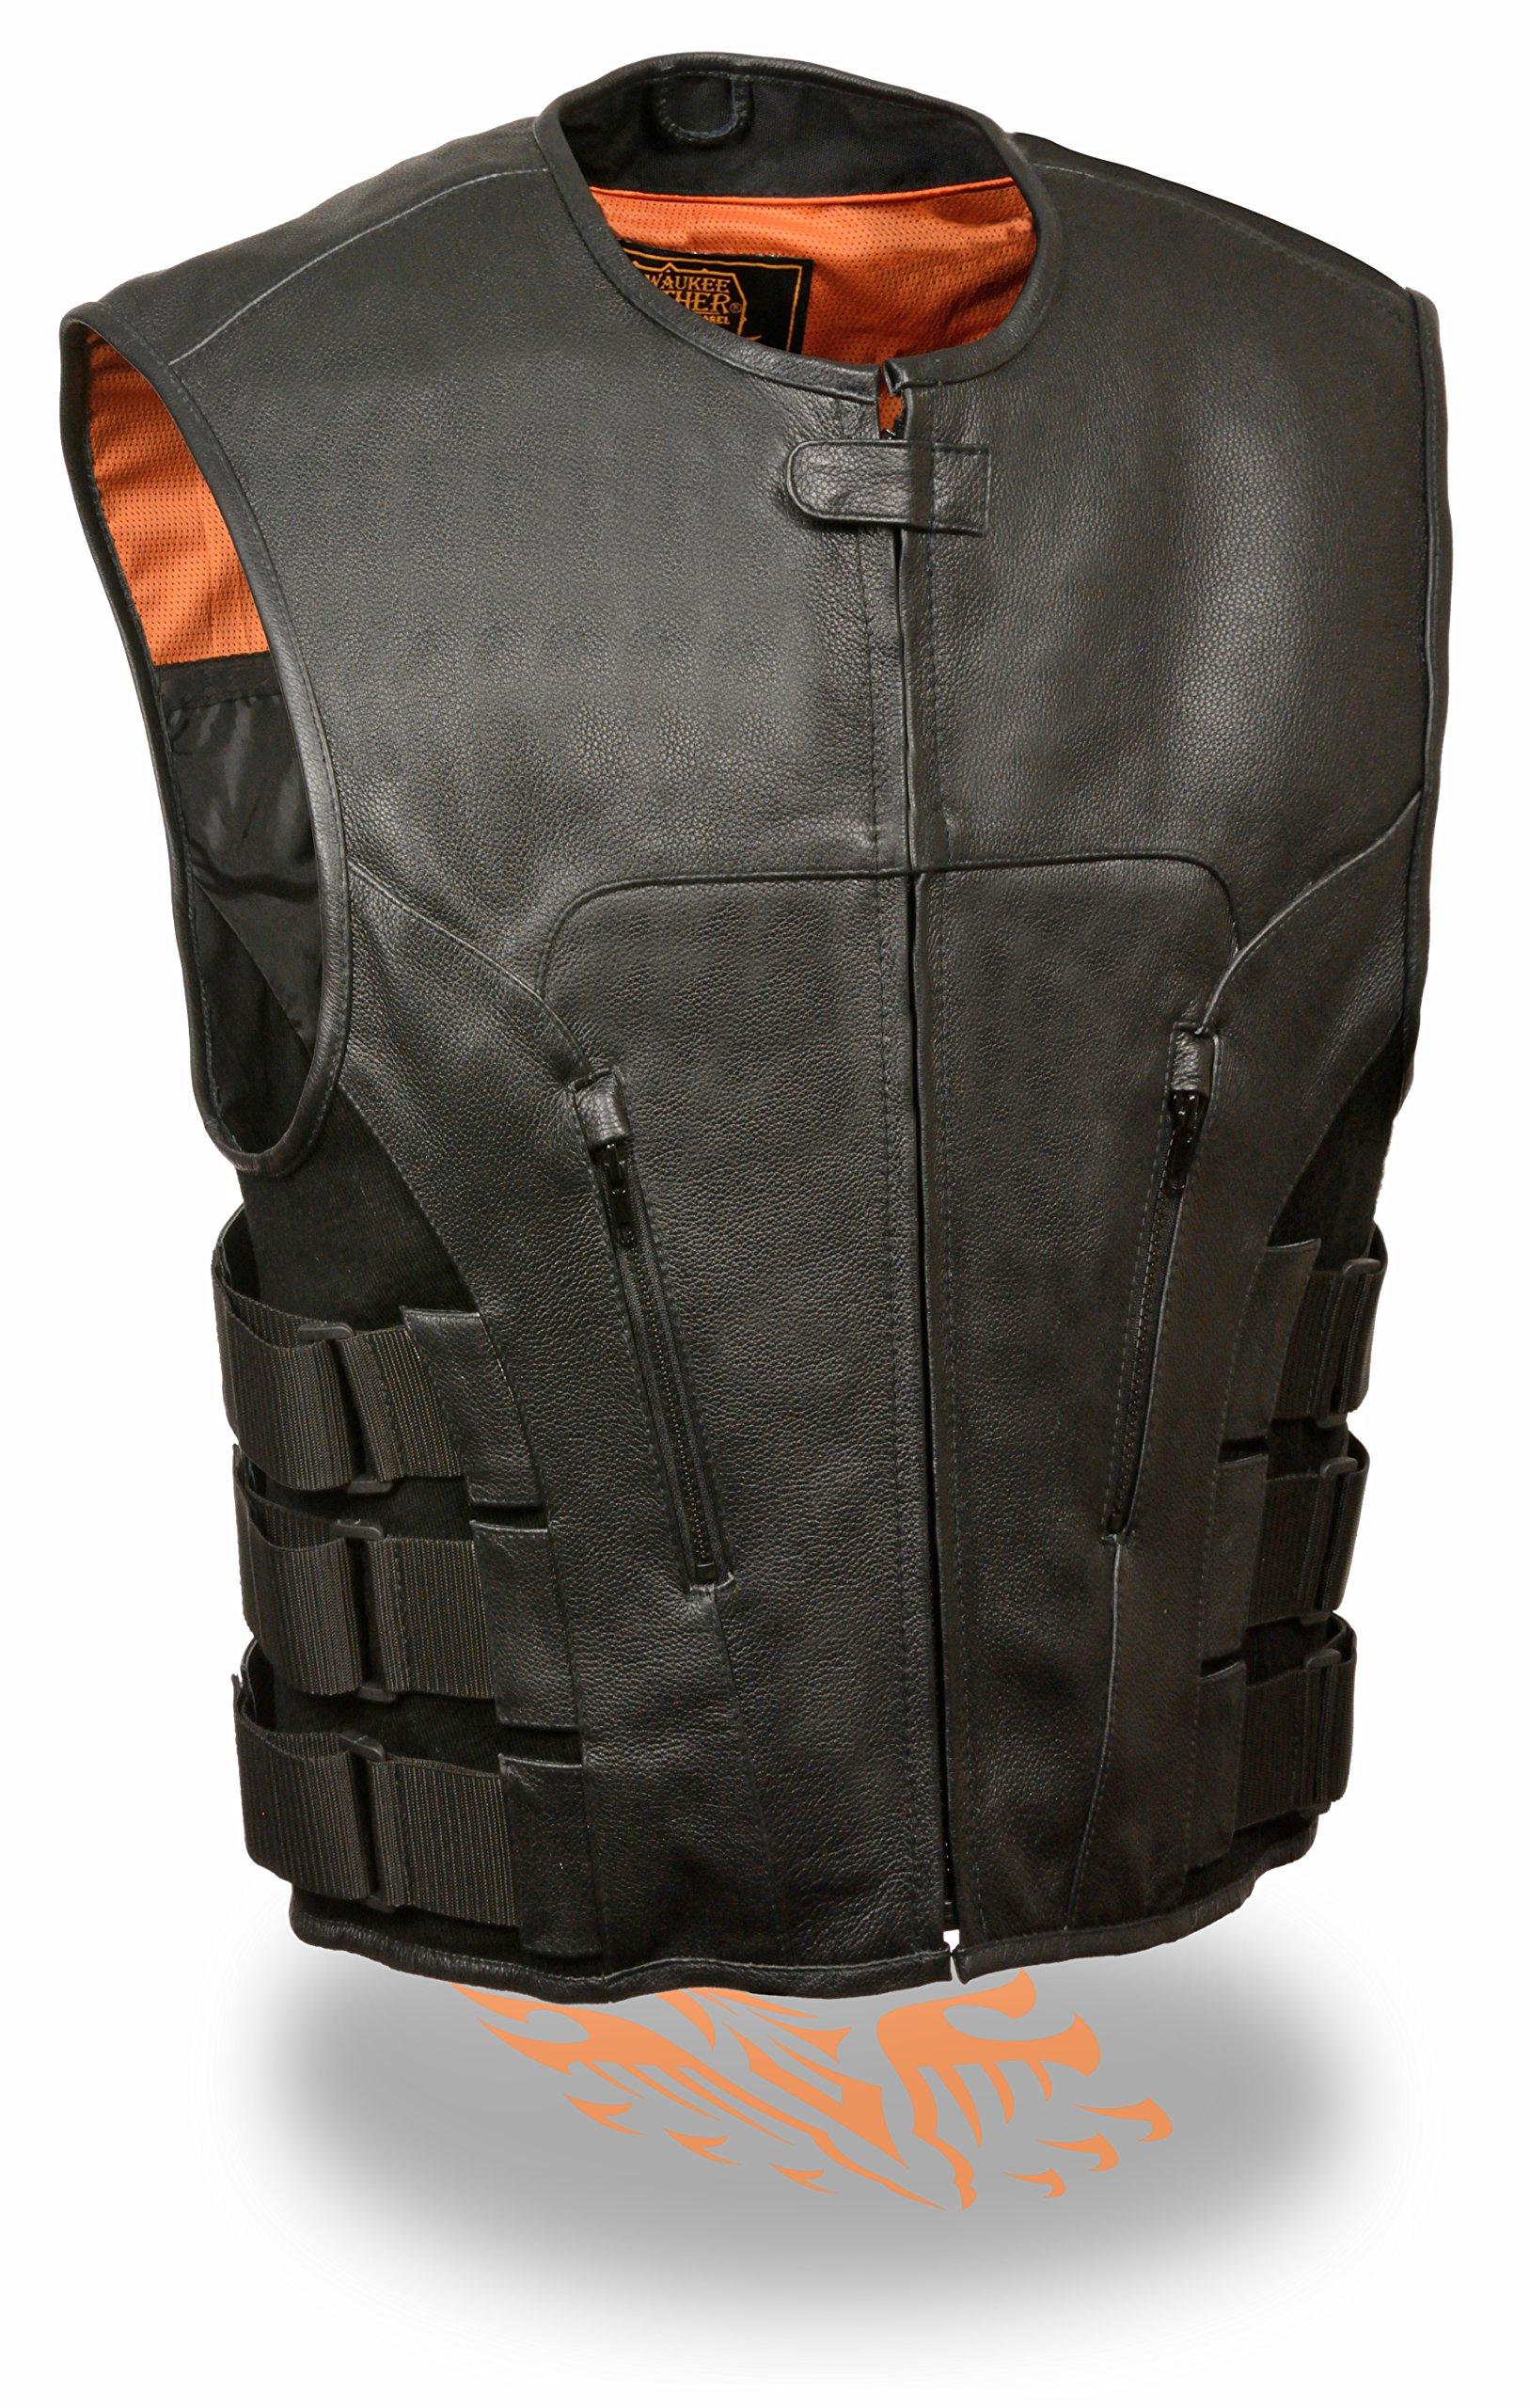 Milwaukee Leather Men's Bullet Proof Look Swat Vest w/ Single Panel Back & Dual Inside Gun Pockets (XX-Large)